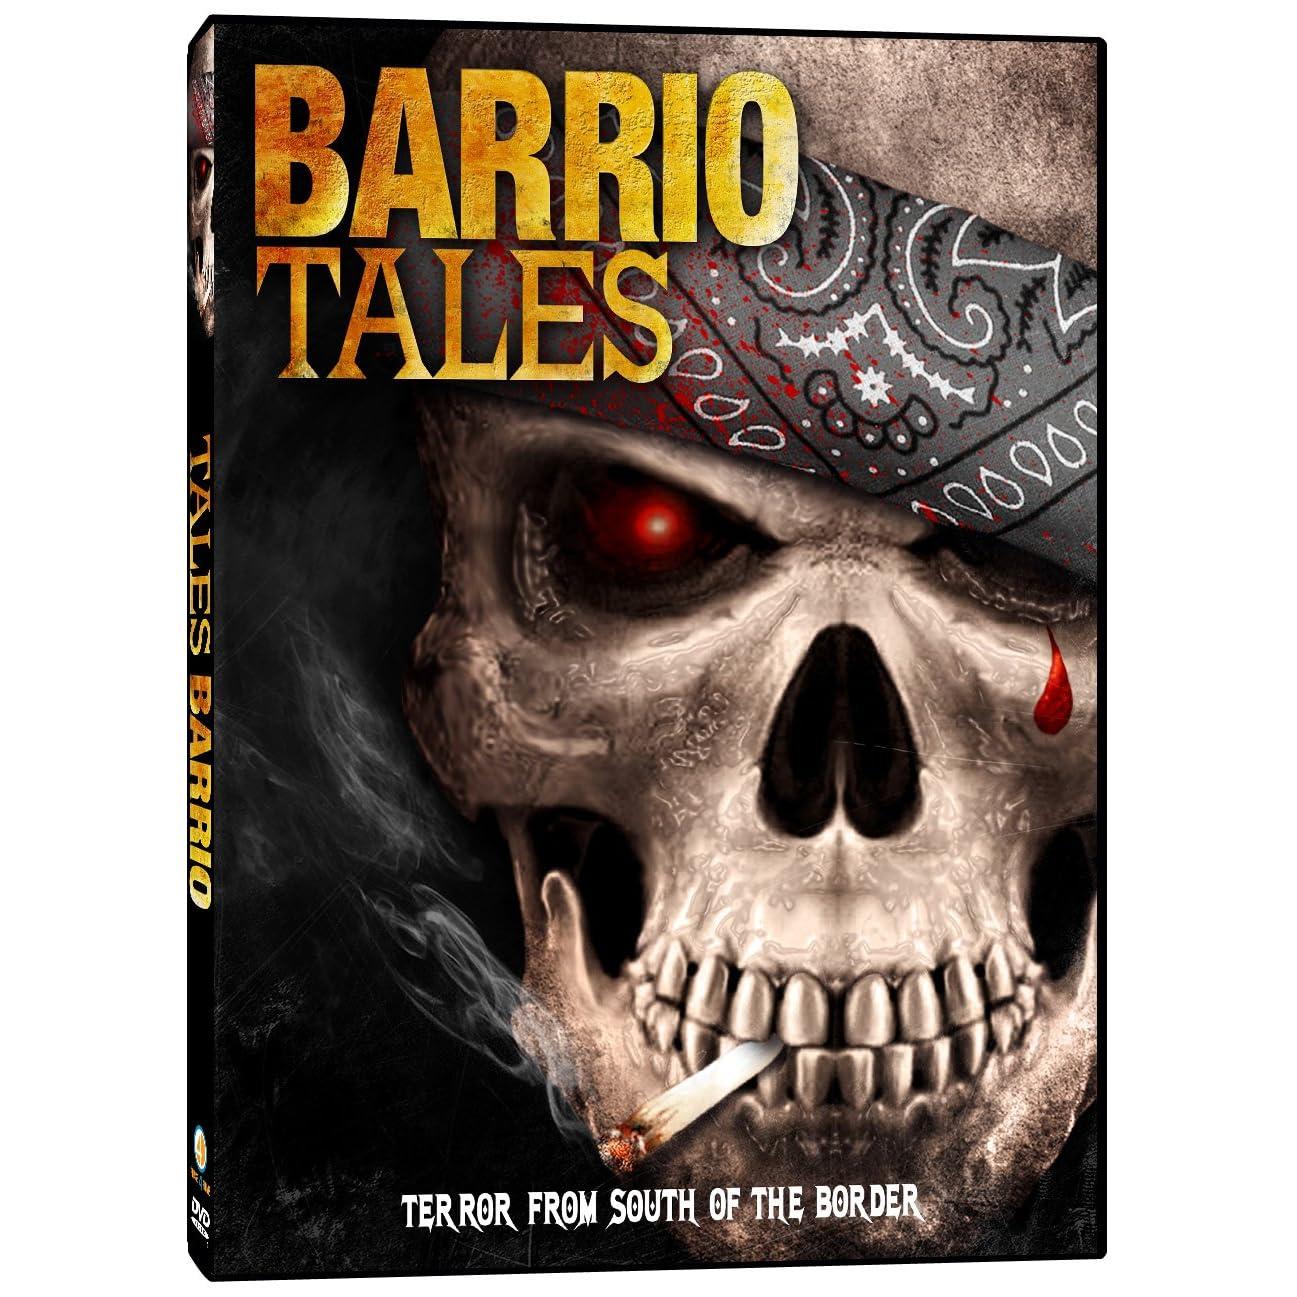 Barrio Tales 2012 NTSC MULTi [DVD-R] [MULTI]